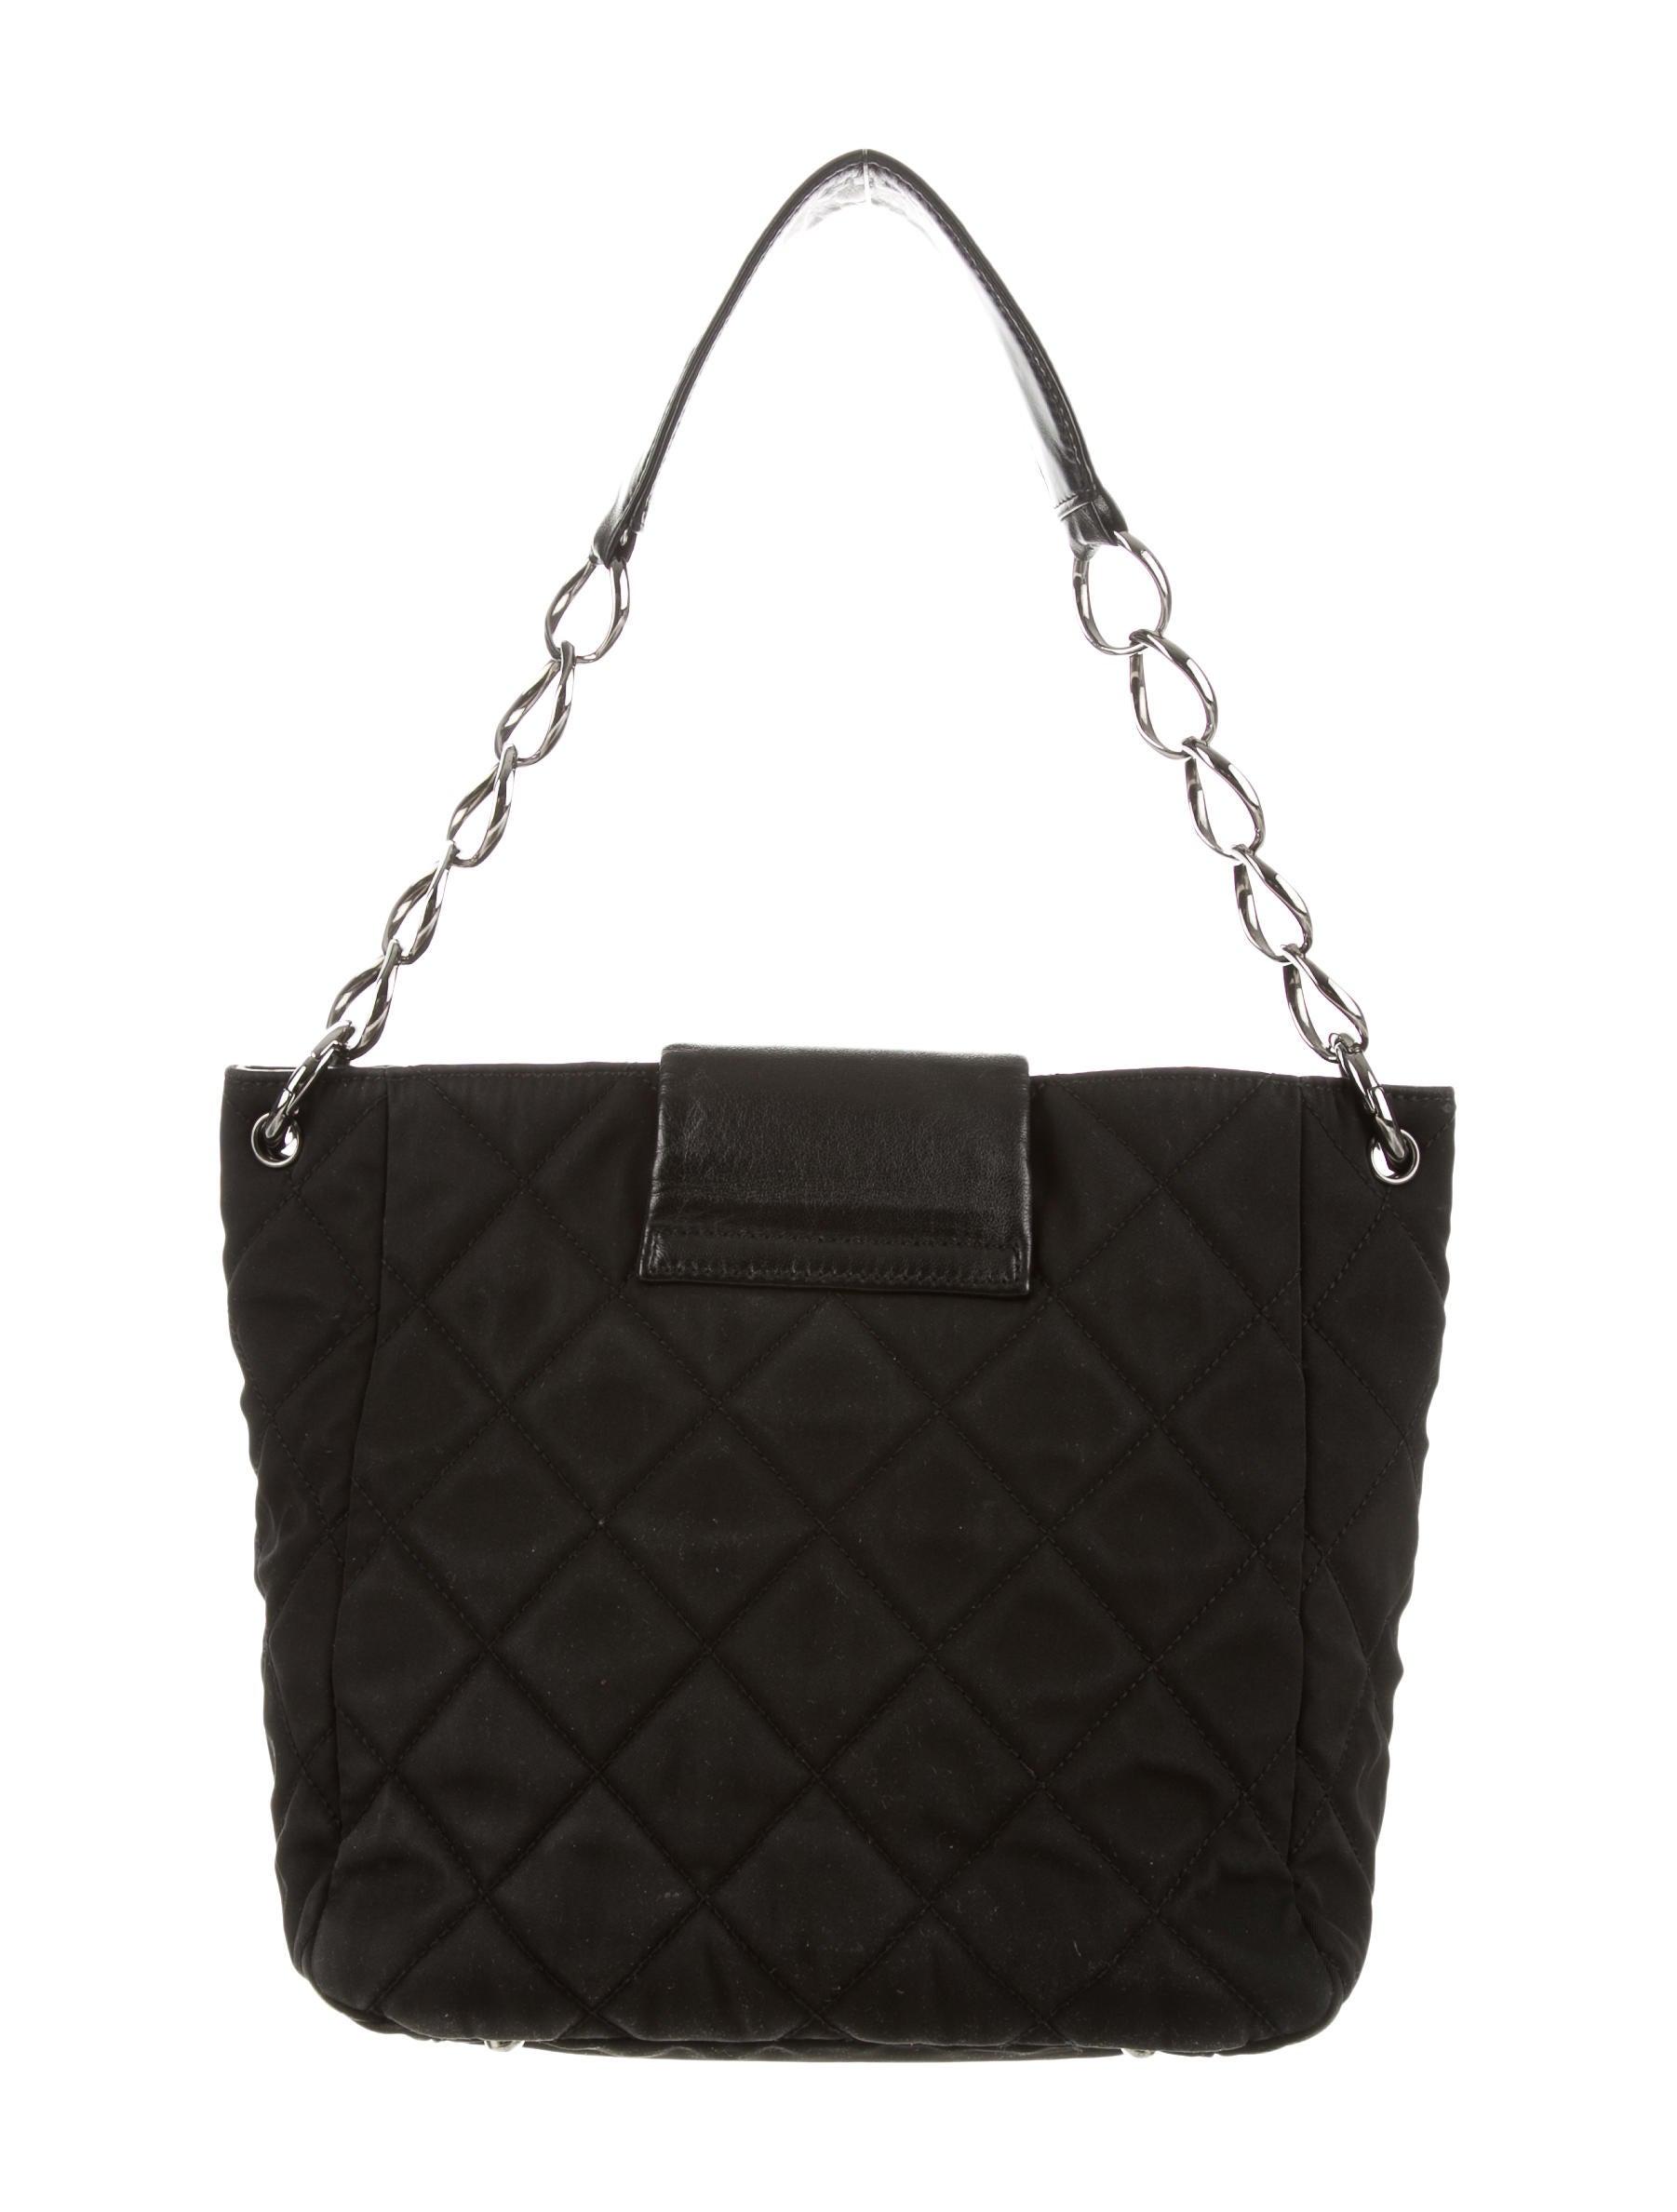 Chanel Quilted Shoulder Bag - Handbags - CHA122577